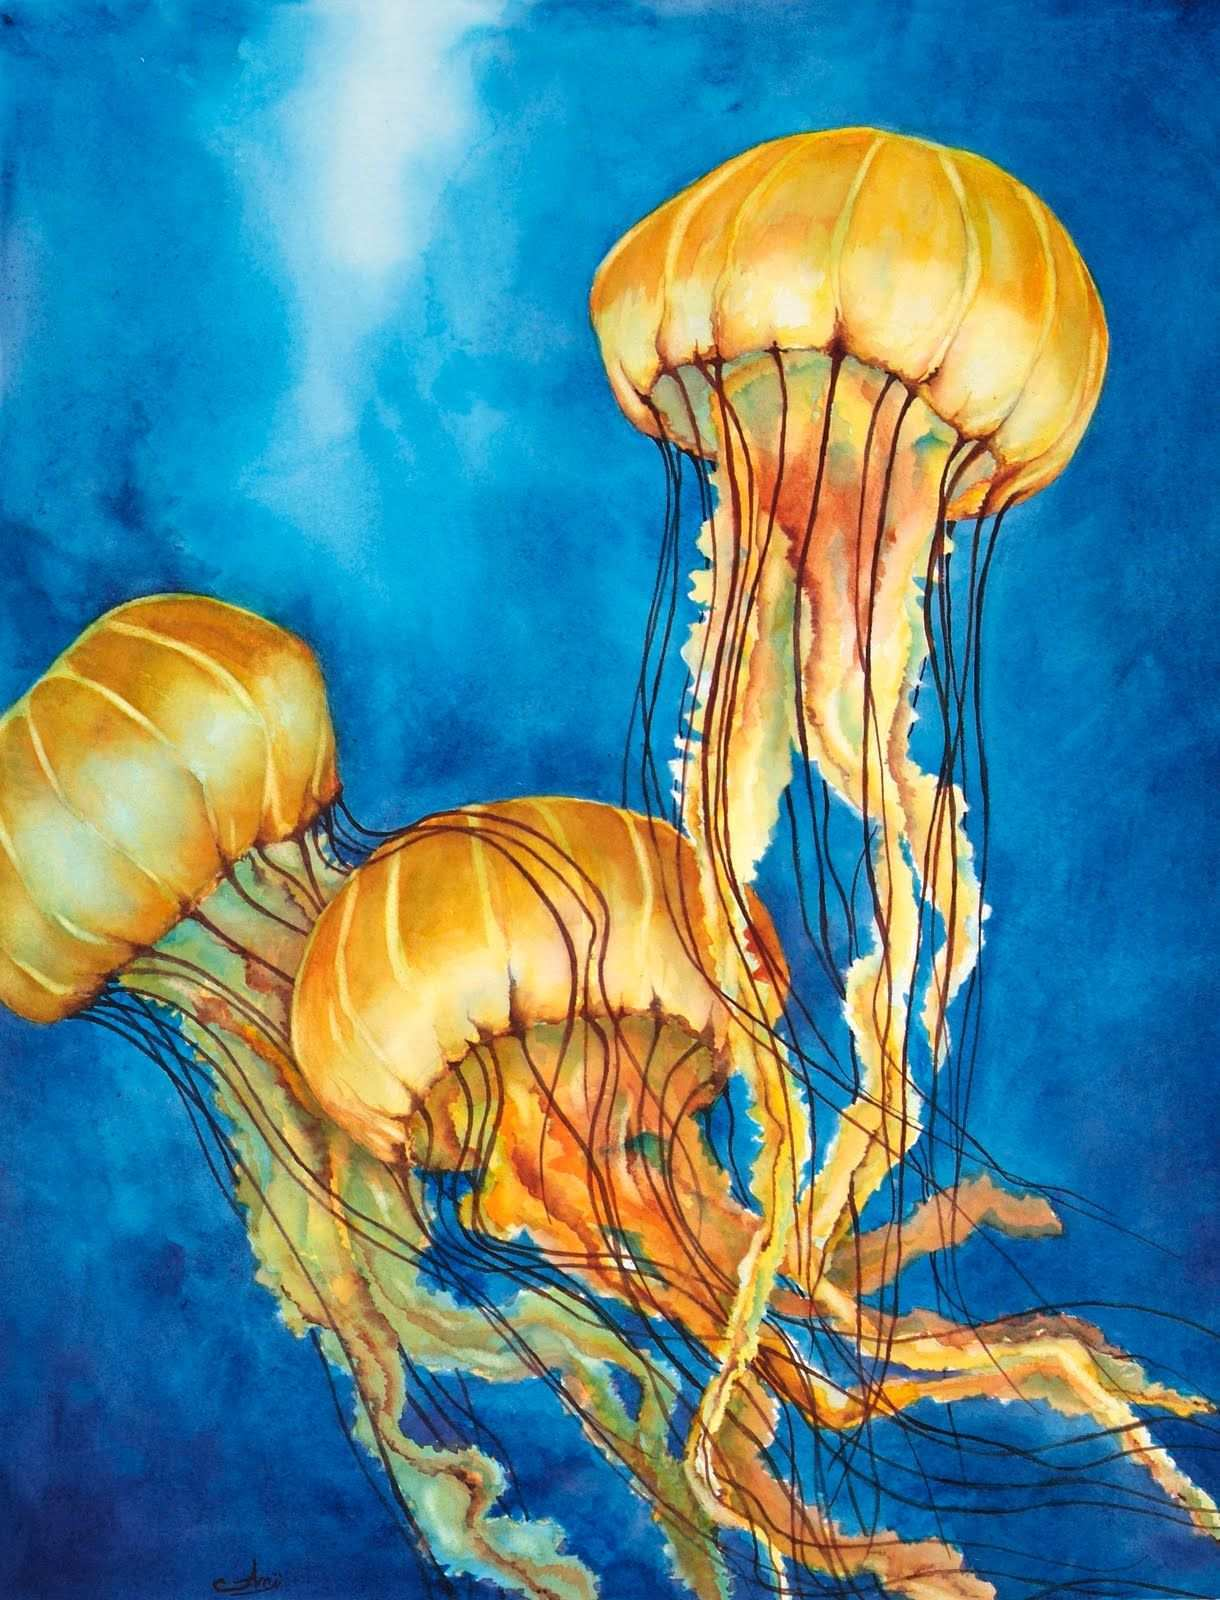 1220x1600 Jellyfish Painting Inspirational Watercolor Jellyfish Paintings